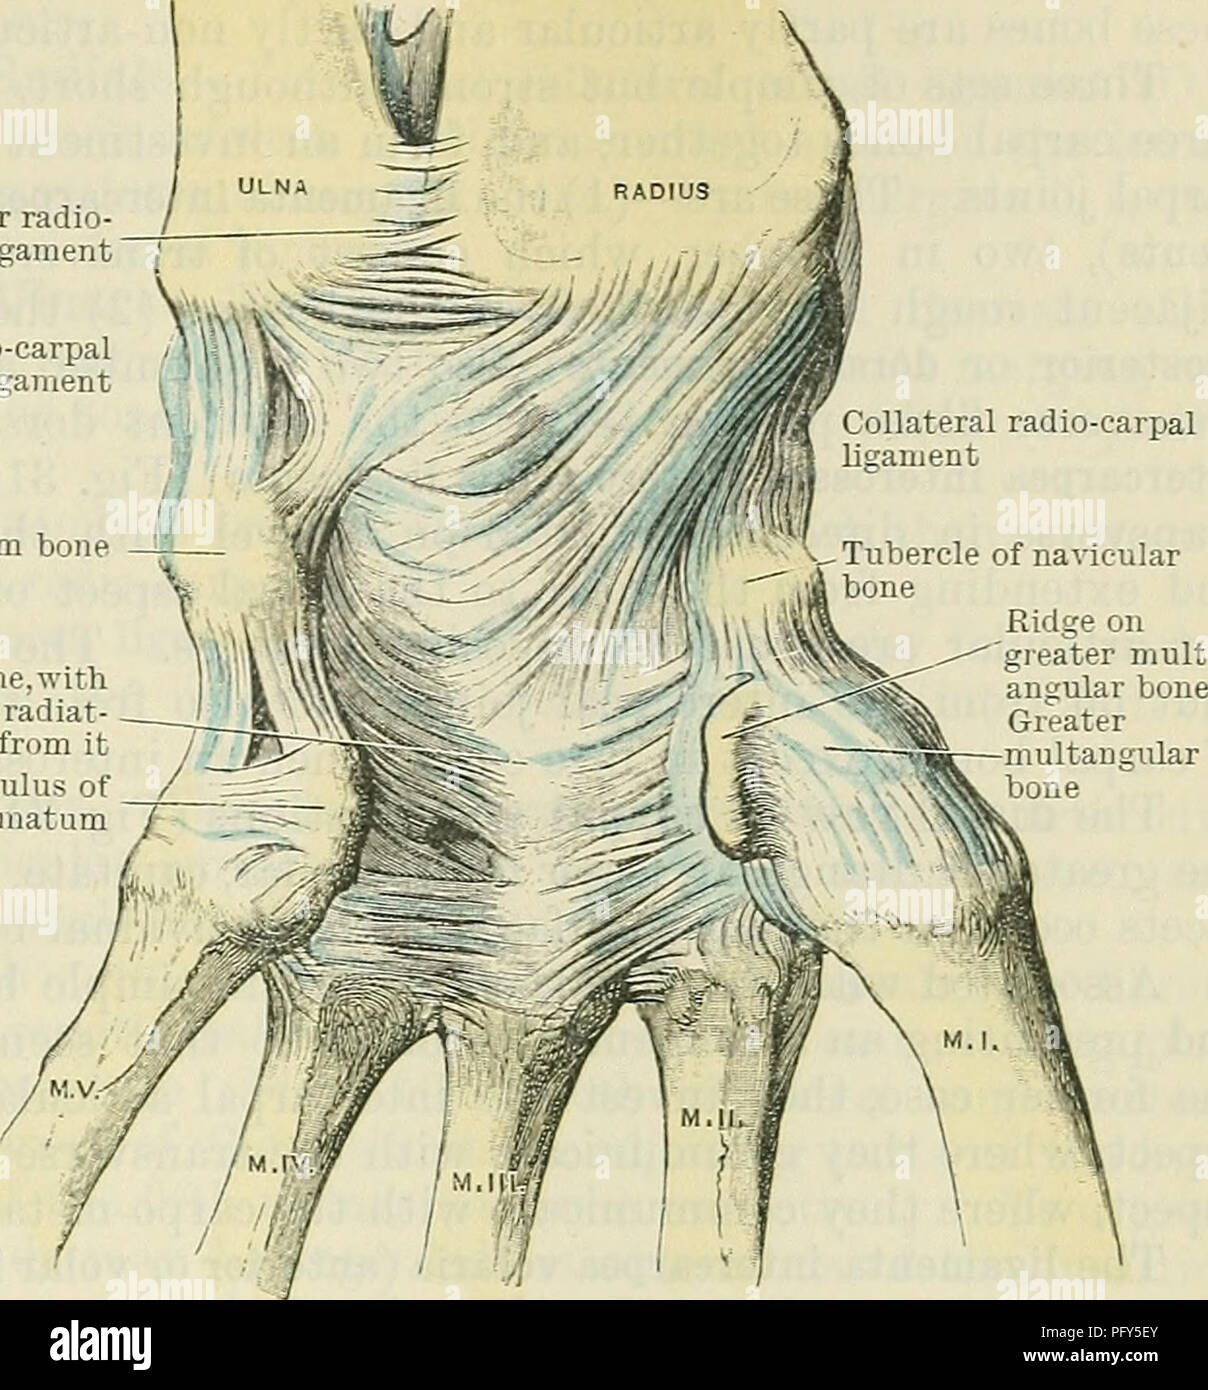 Styloid Bone Stock Photos & Styloid Bone Stock Images - Alamy